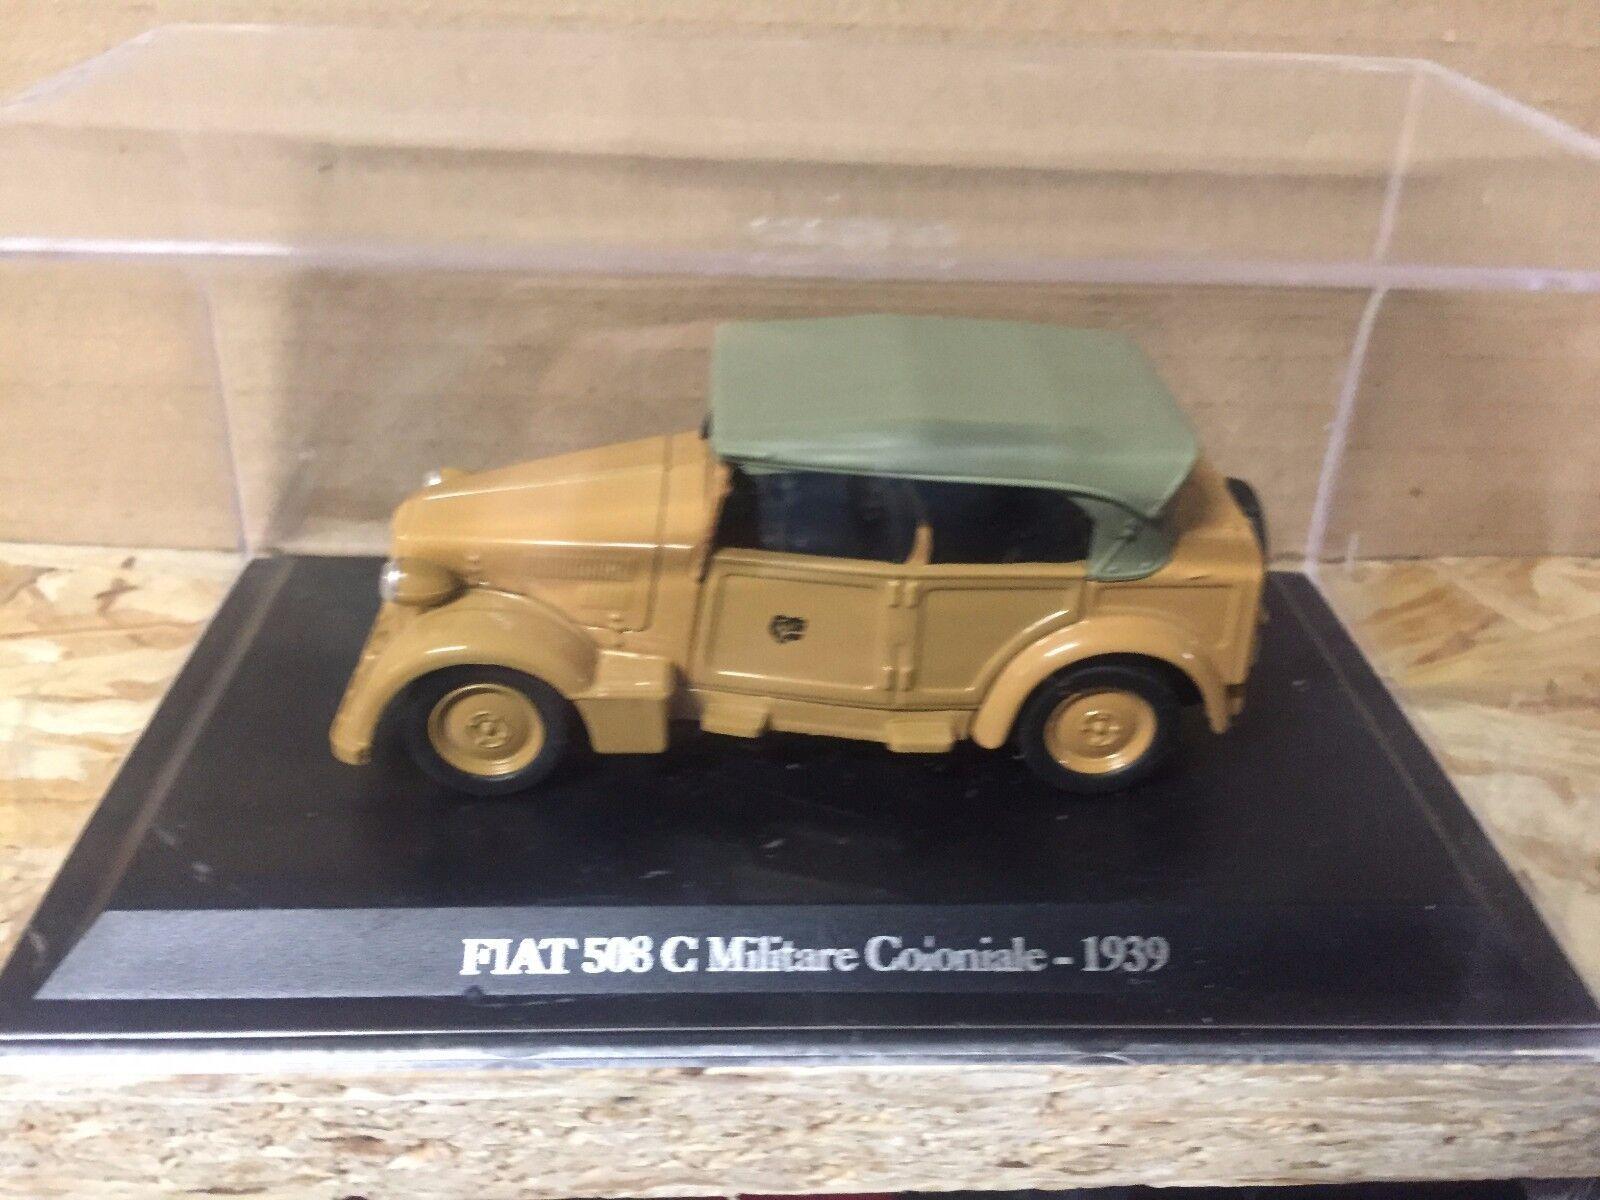 DIE CAST   FIAT 508 C C C MILITARE COLONIALE - 1939   + TECA RIGIDA BOX 2 SCALA 1 43 a1f8de